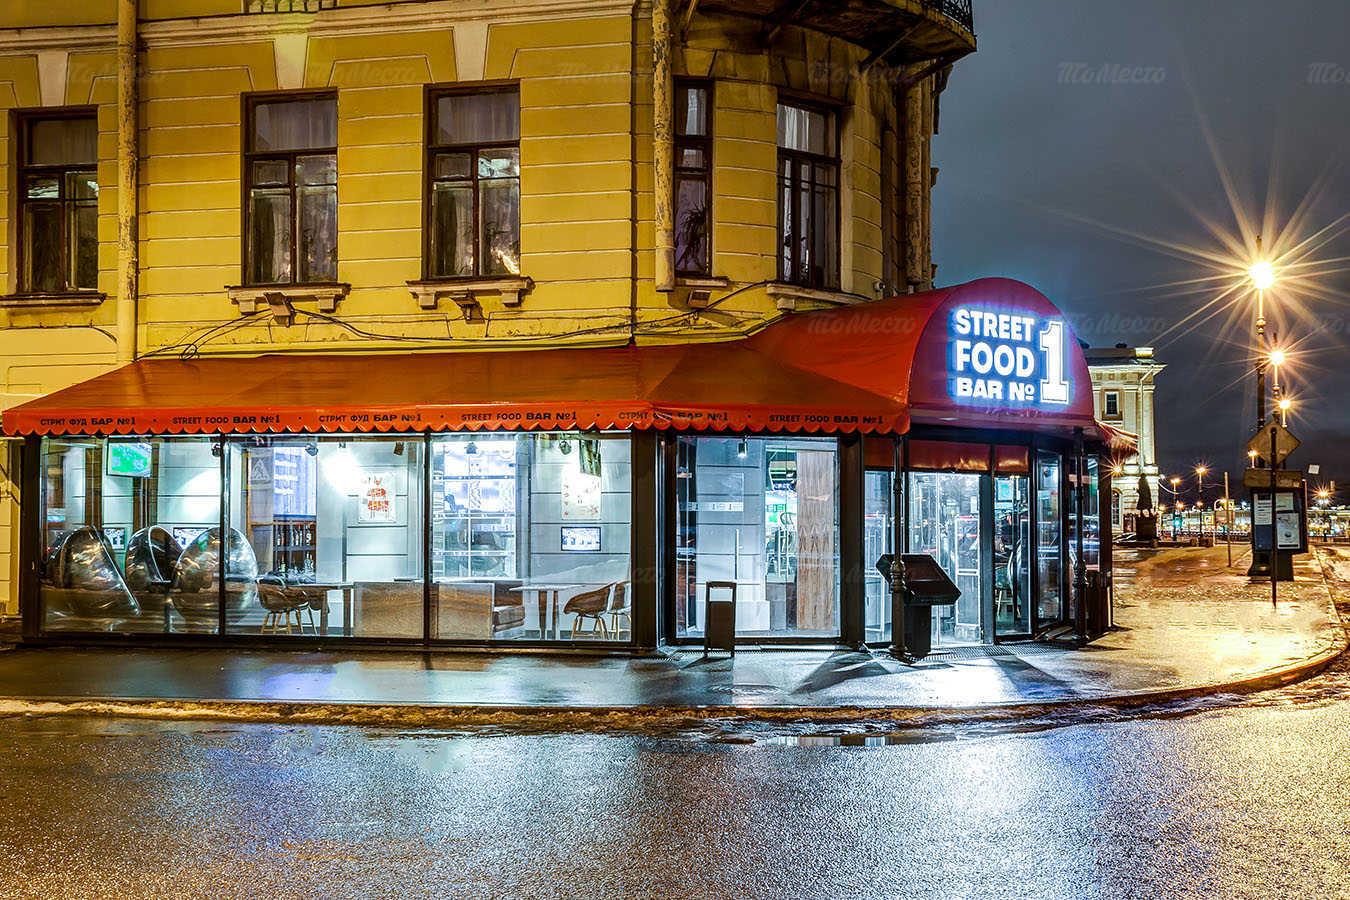 Ресторан Street food bar №1 (Стрит фуд бар №1) на Университетской набережной фото 5